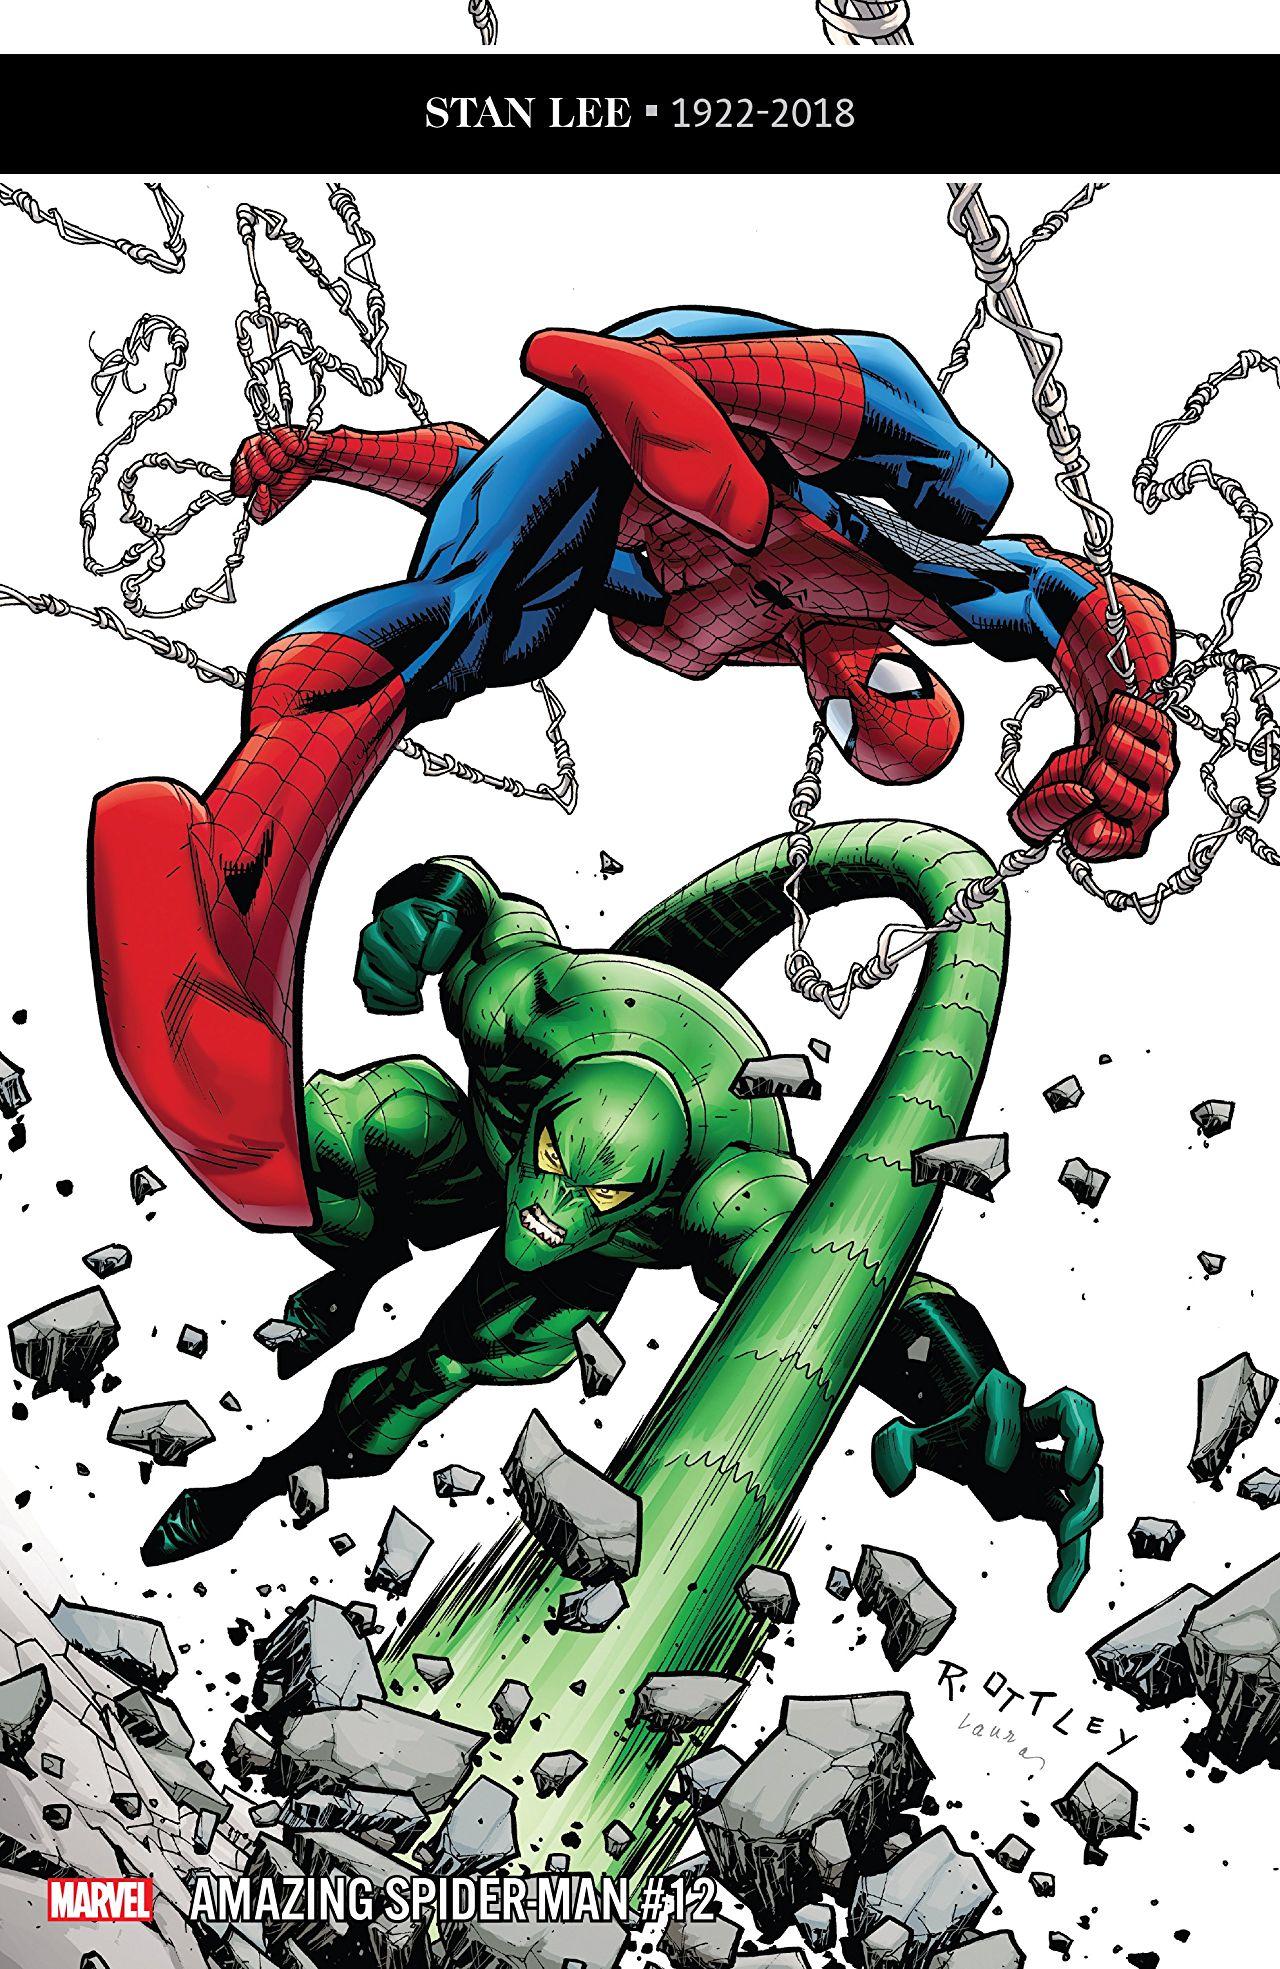 The Amazing Spider-Man 12